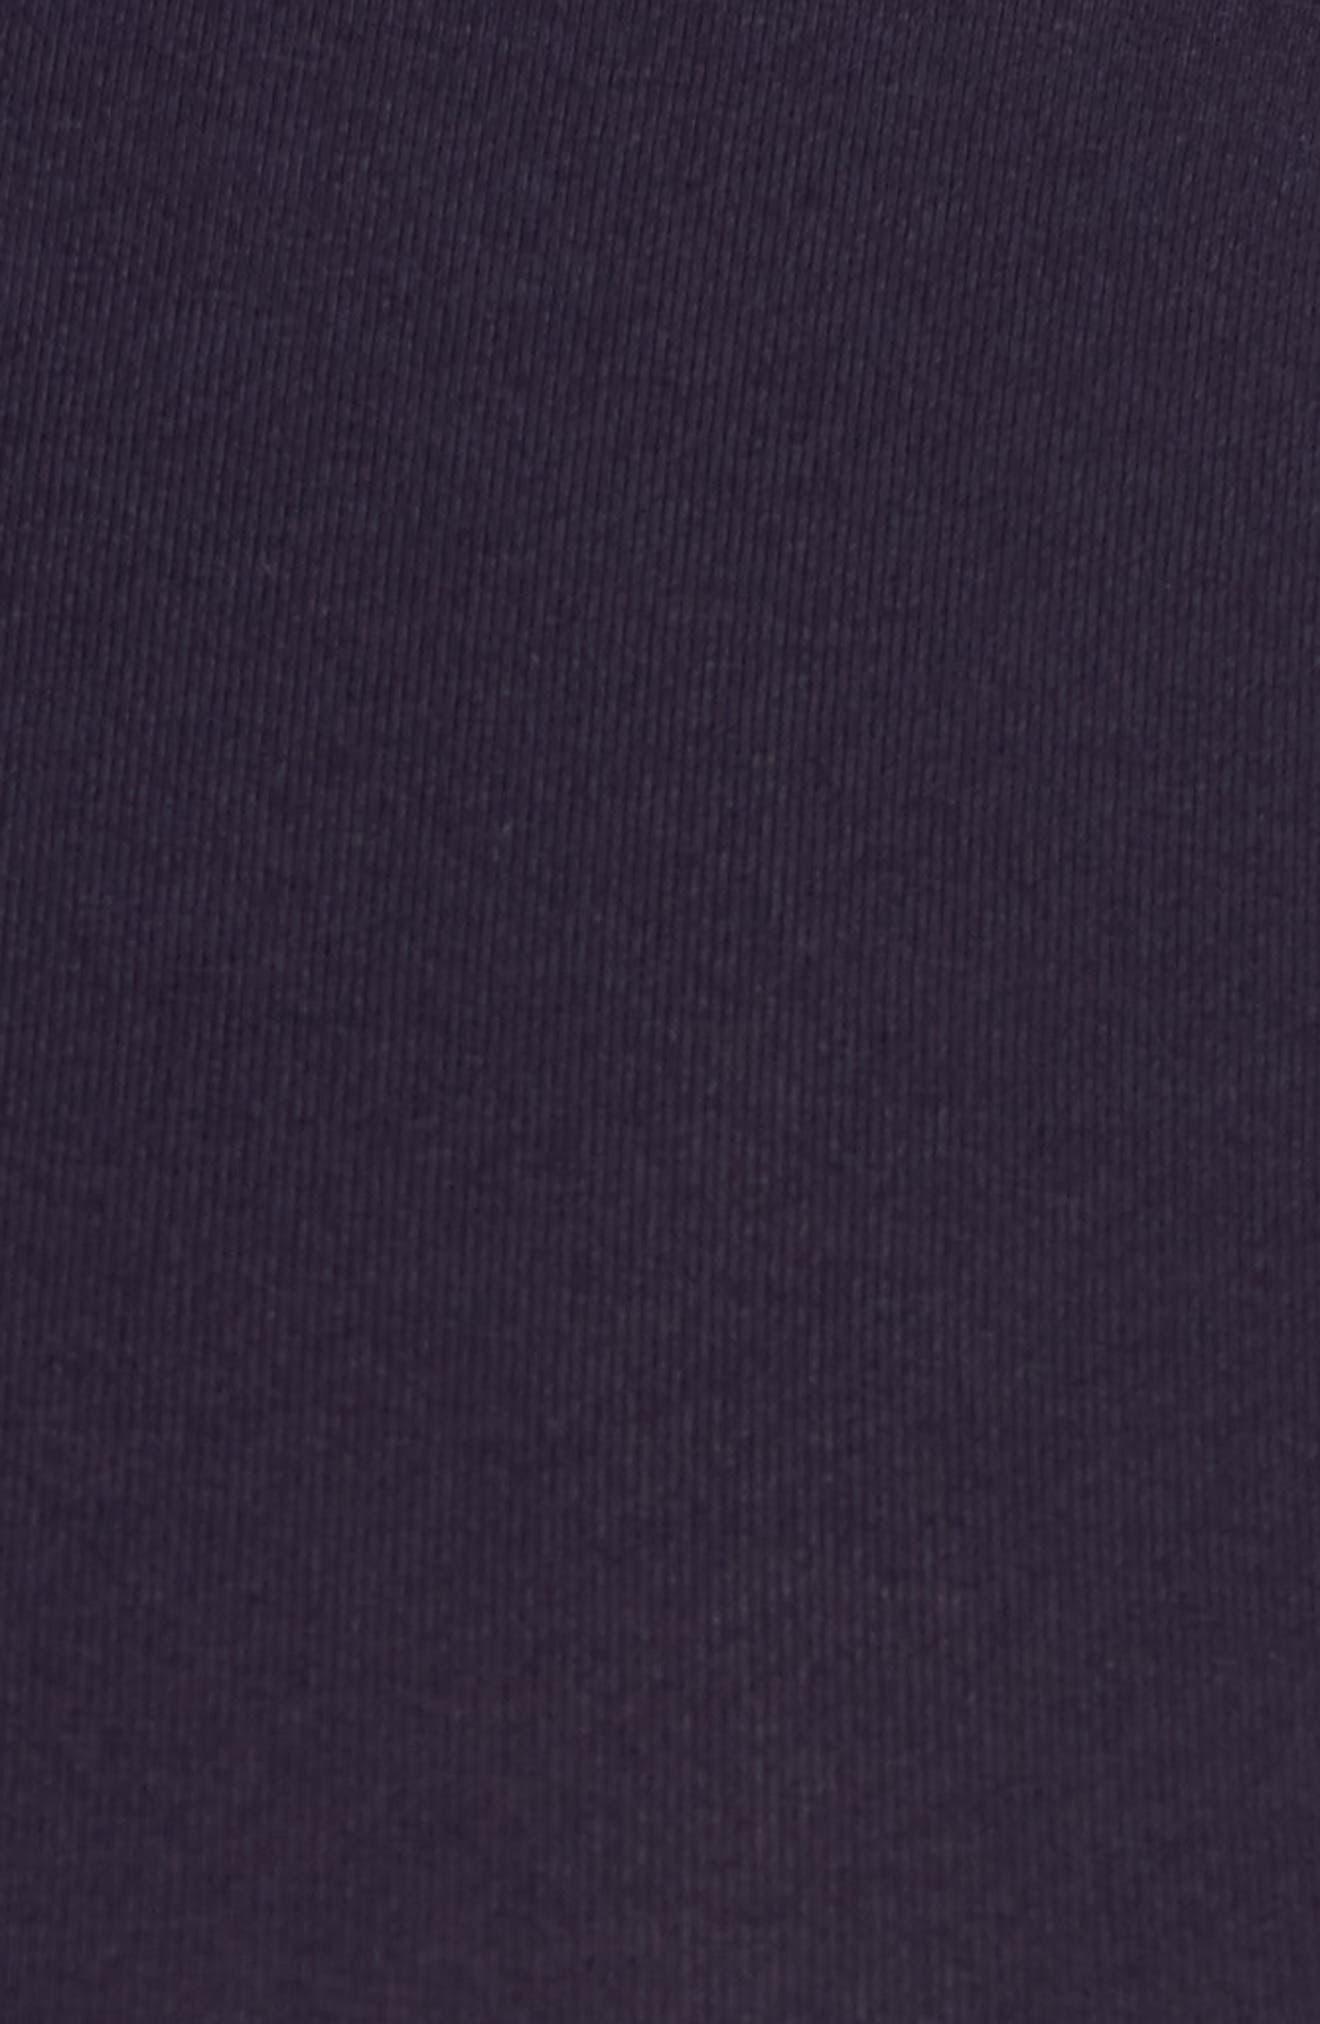 'Poppy' Ruched Surplice Maternity Top,                             Alternate thumbnail 5, color,                             Darkest Navy